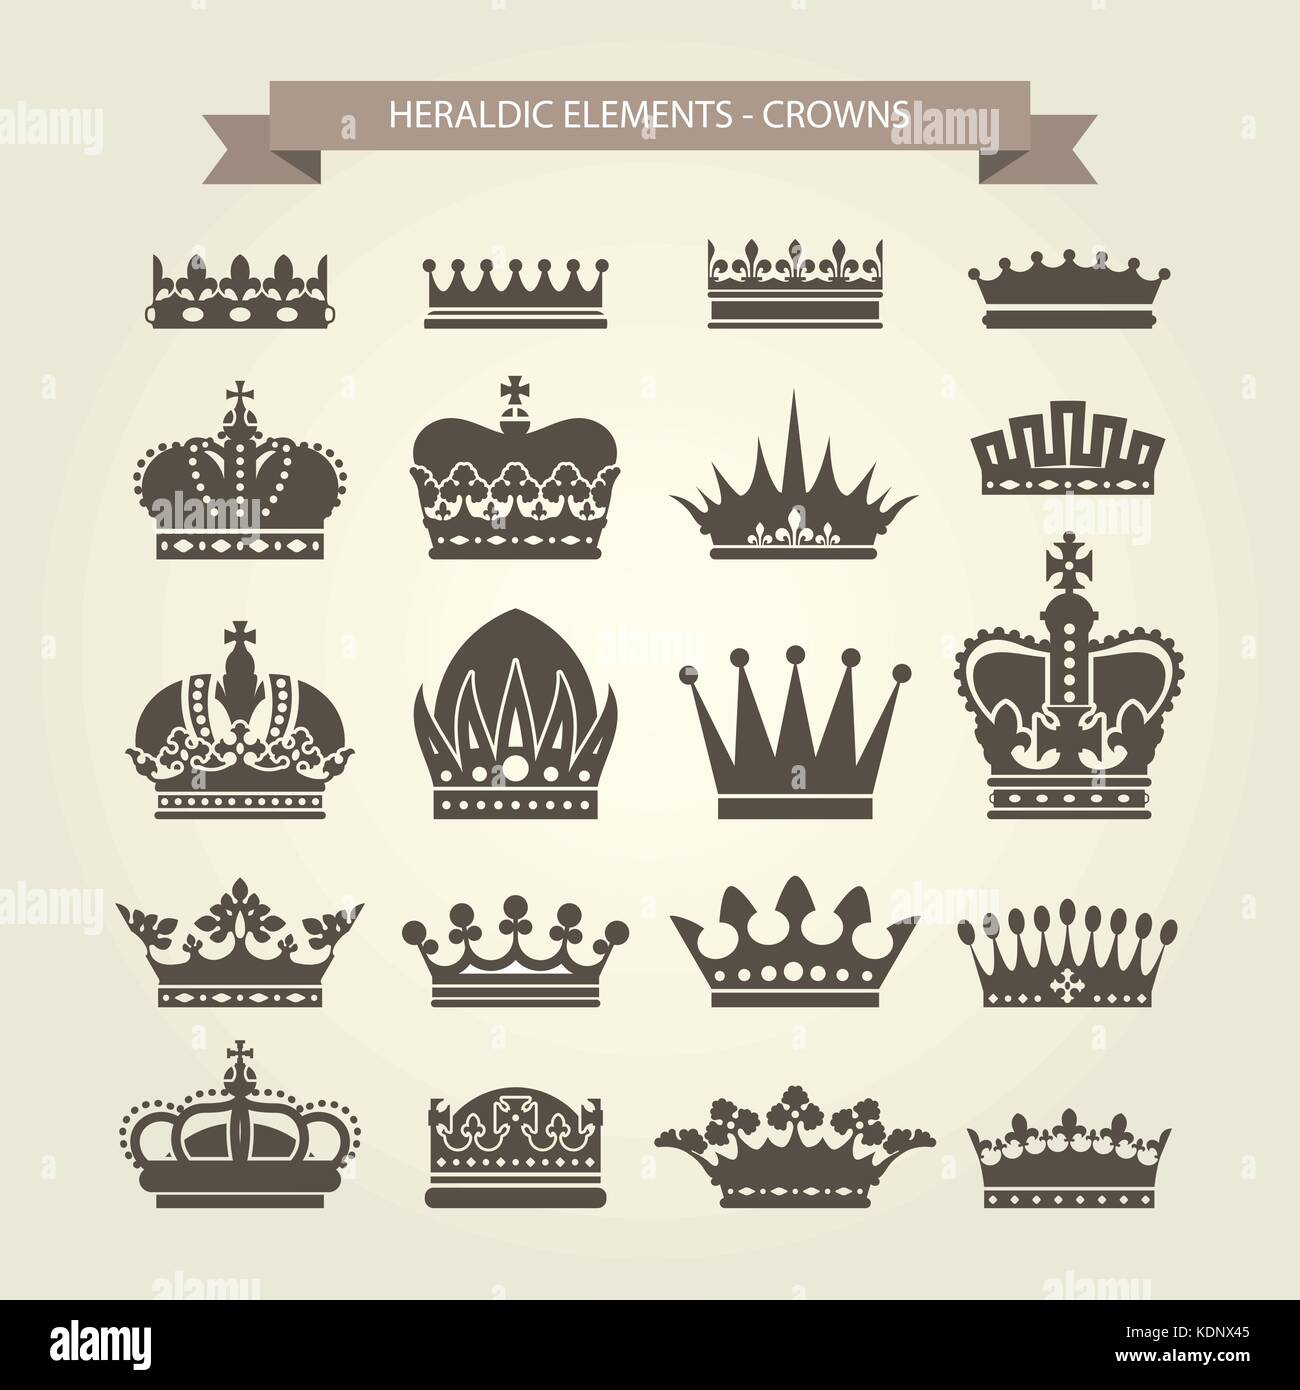 Heraldic crowns set - monarchy coronet and elite symbols - Stock Vector